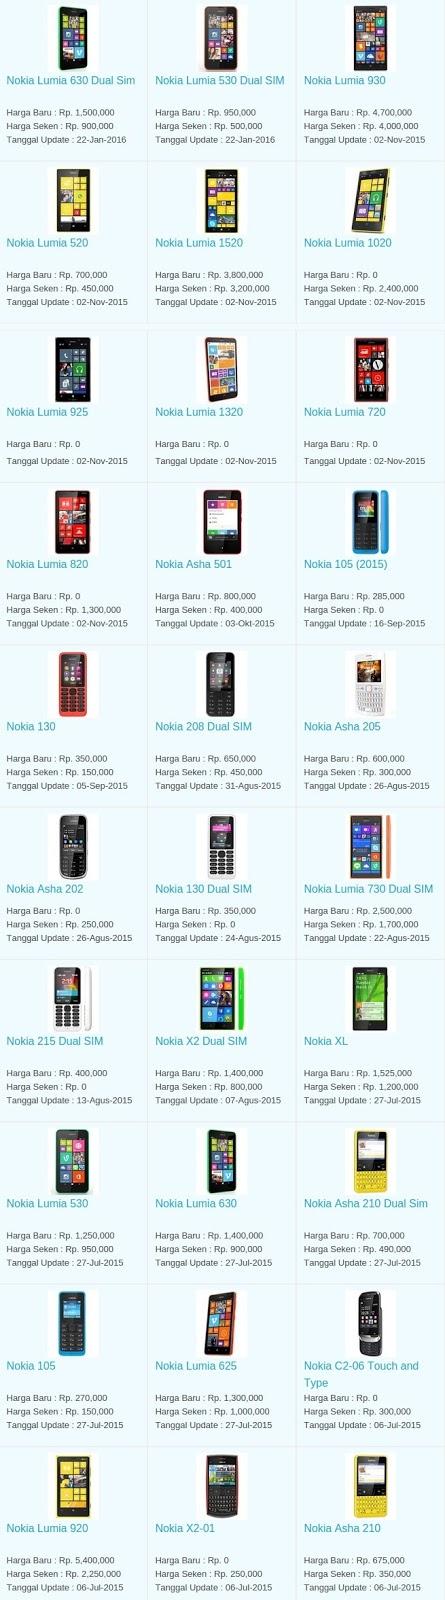 Daftar Harga Hp Terbaru Nokia Mei 2016